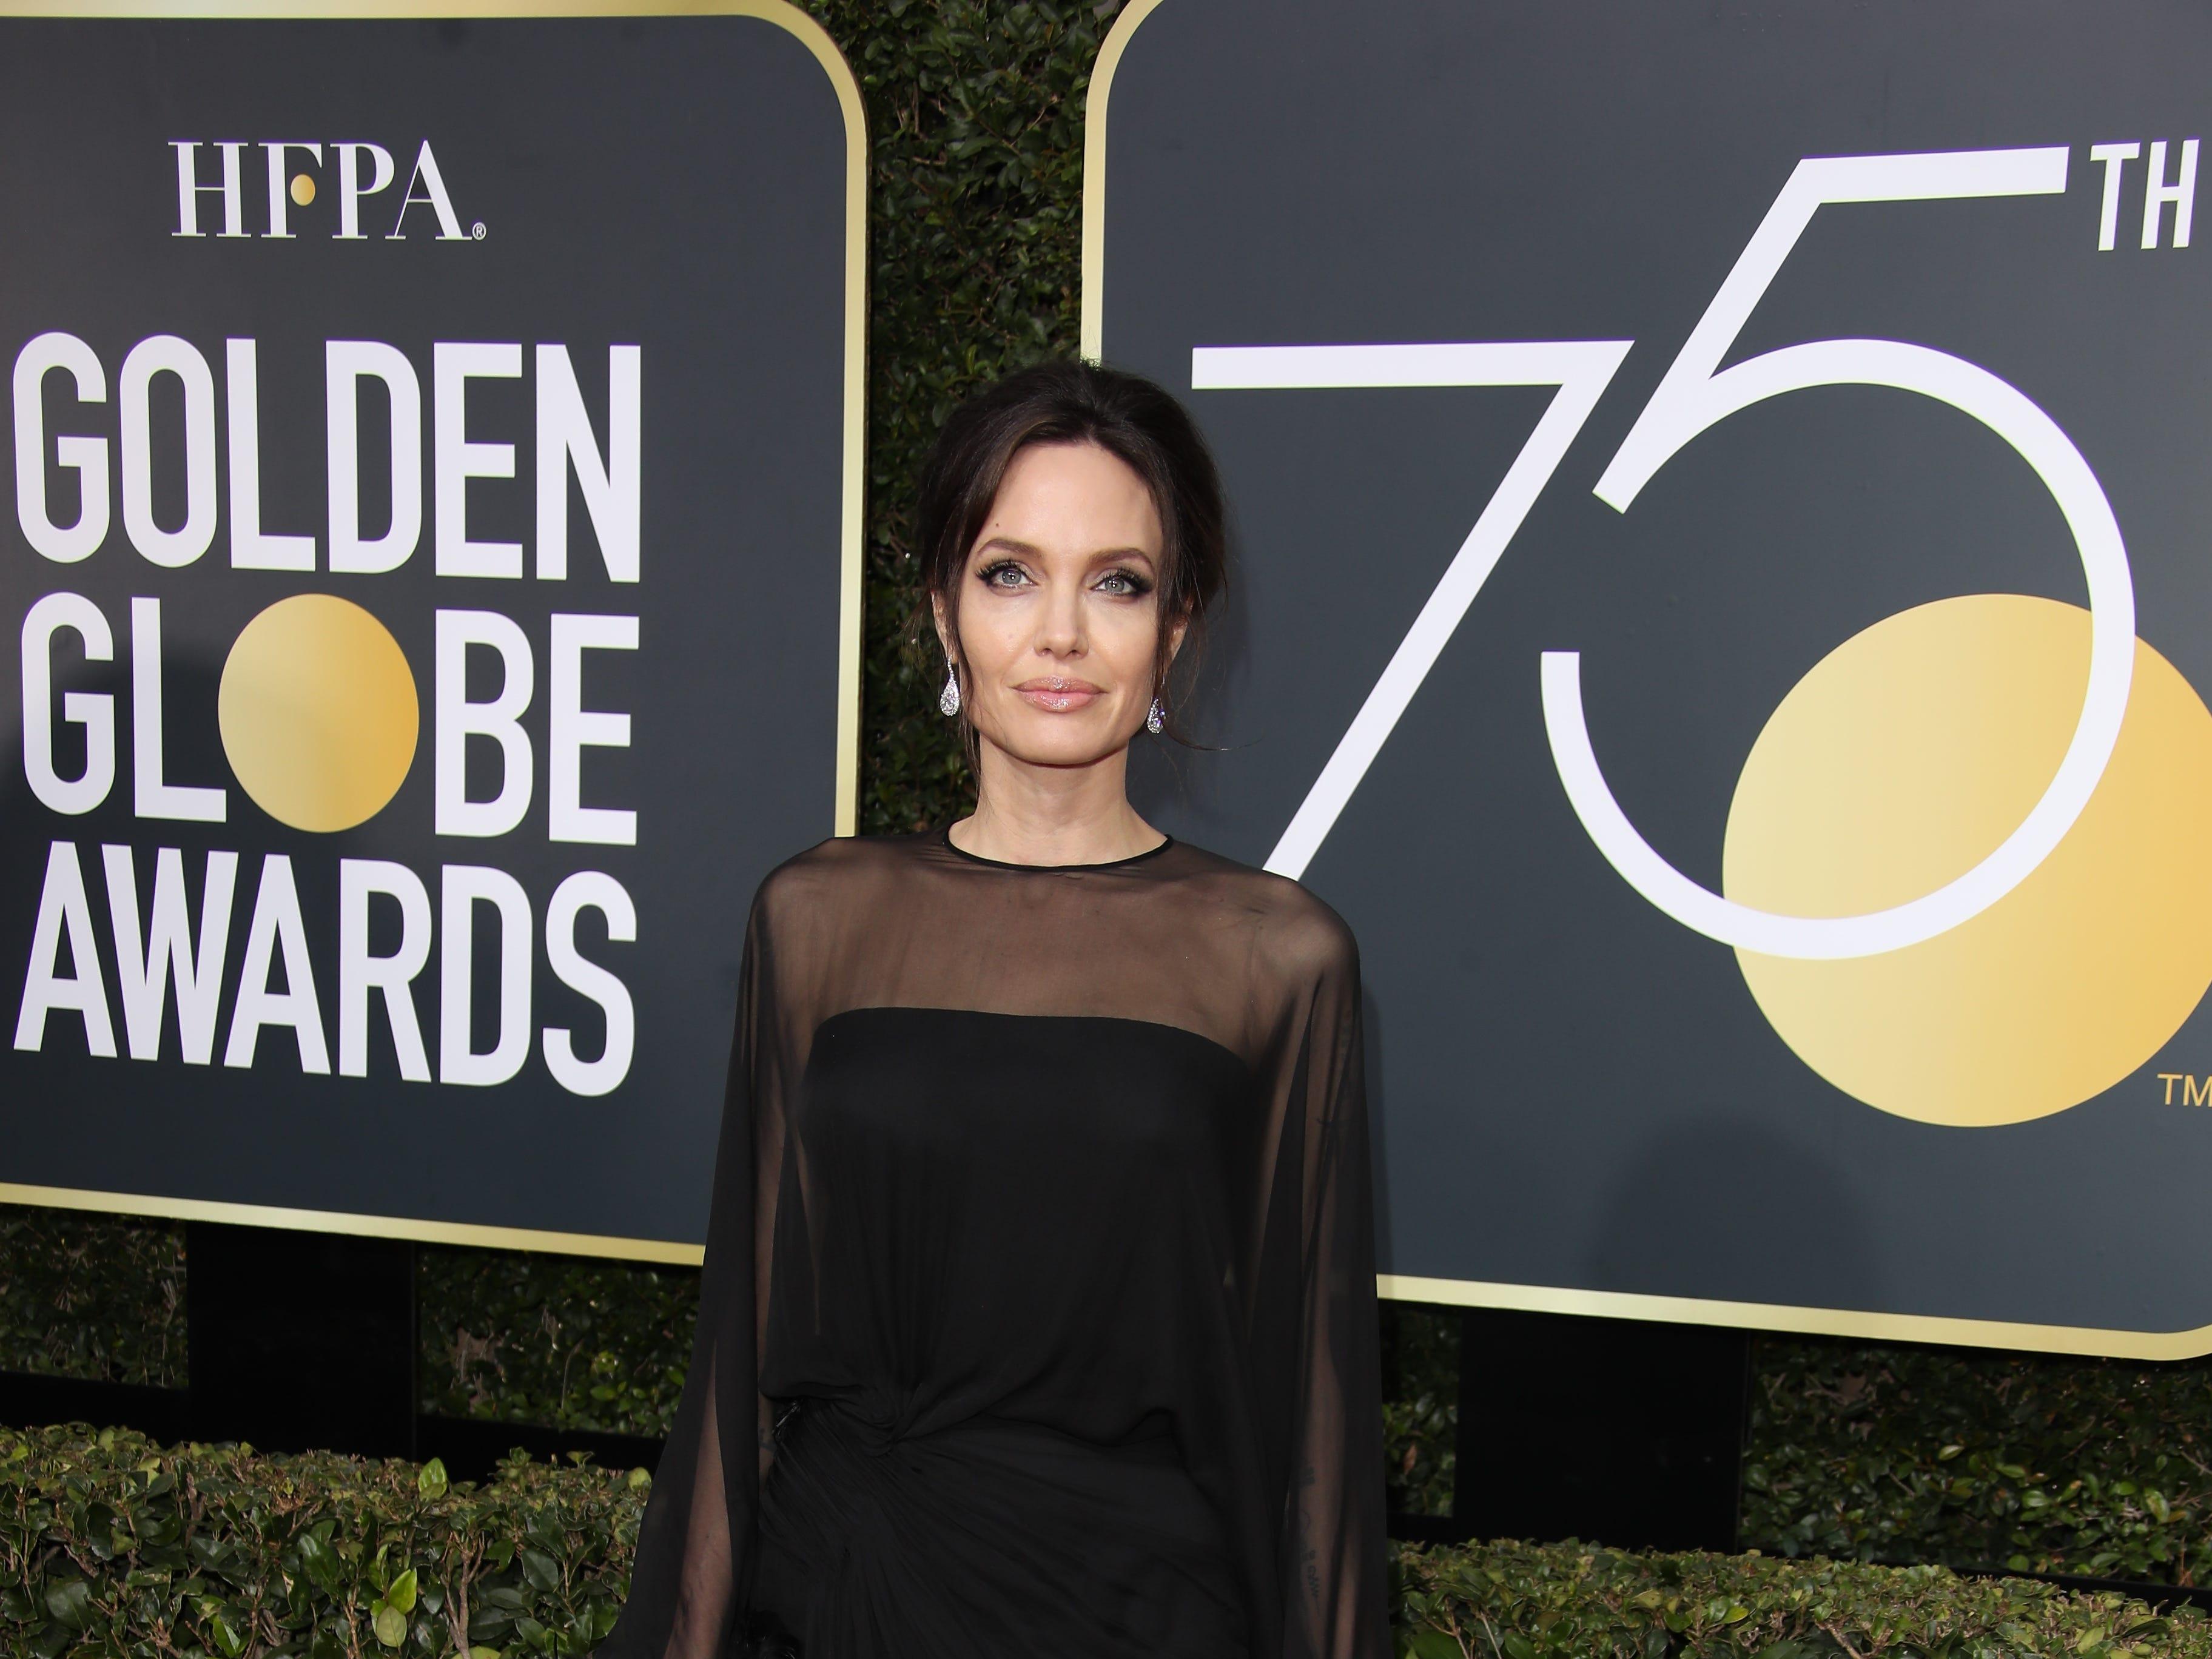 Jan 7, 2018; Beverly Hills, CA, USA;  Angelina Jolie arrives for the 75th Golden Globe Awards at the Beverly Hilton. Mandatory Credit: Dan MacMedan-USA TODAY NETWORK (Via OlyDrop)